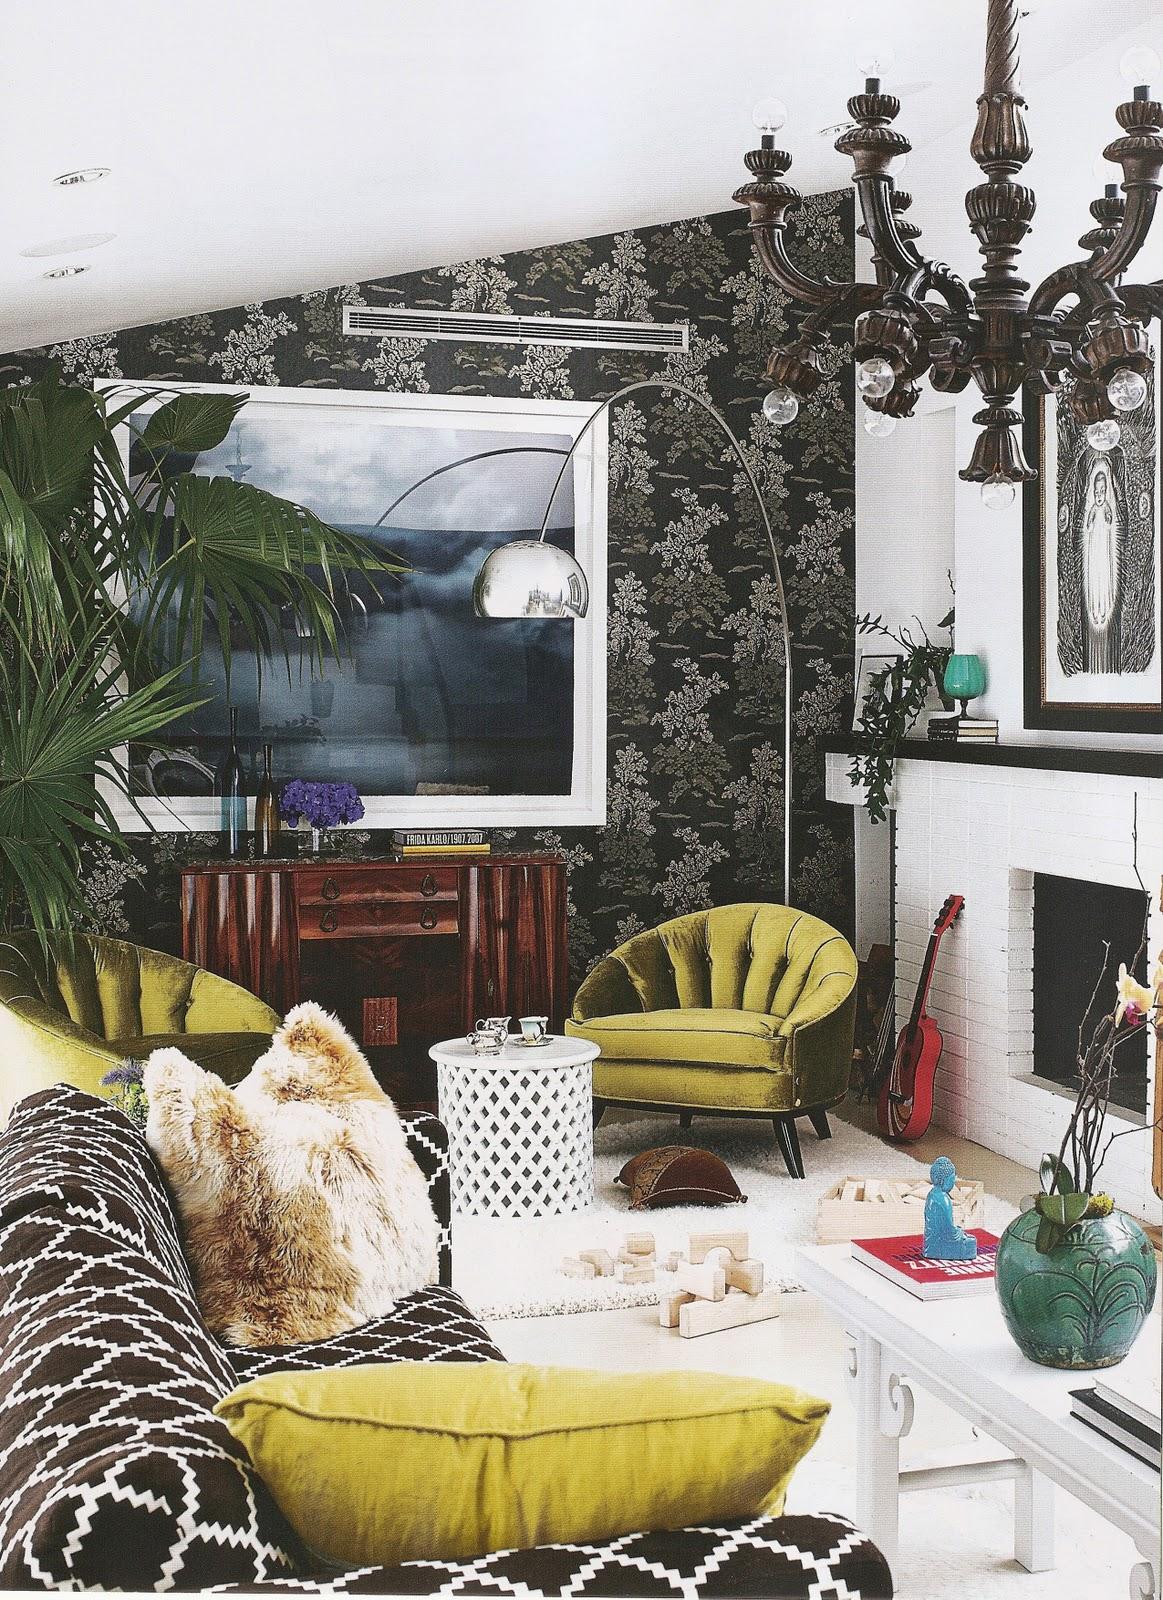 http://2.bp.blogspot.com/_DbiPXrC6v5Q/TDzBNXwBrSI/AAAAAAAAAtw/dmGBixTqbqk/s1600/livingroom.jpg